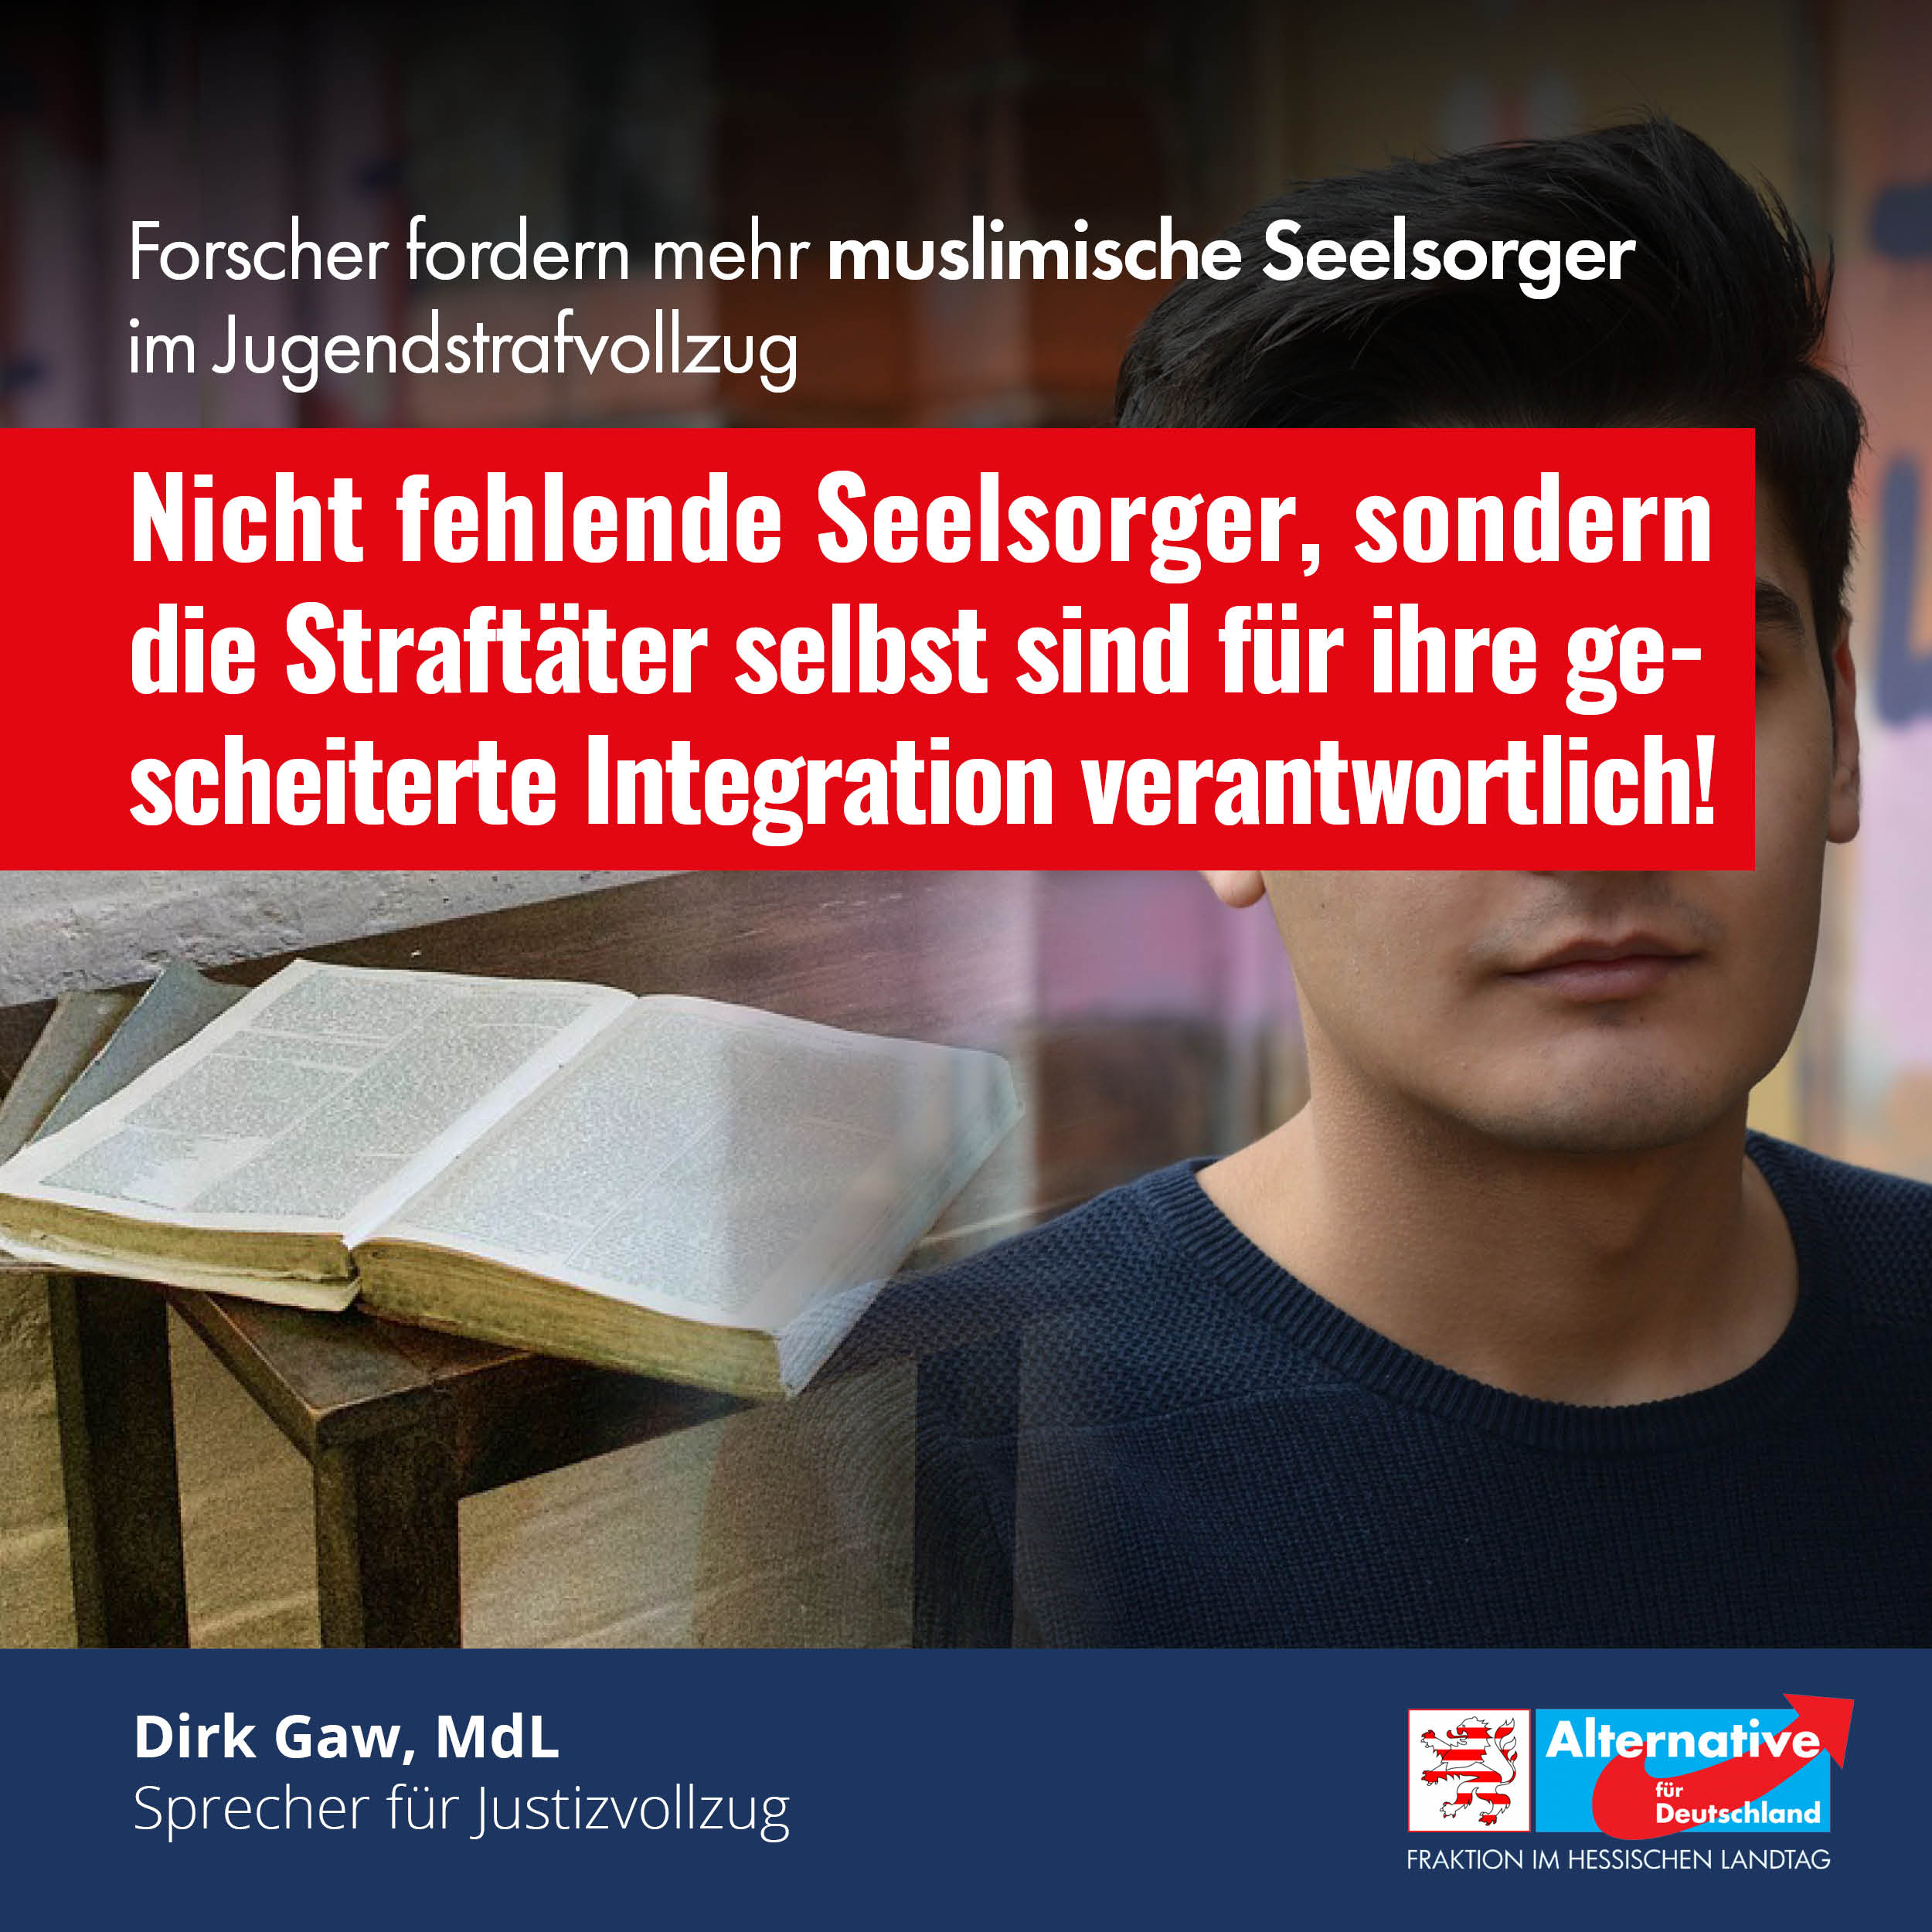 Read more about the article Forscher fordern mehr muslimische Seelsorger im Jugendstrafvollzug